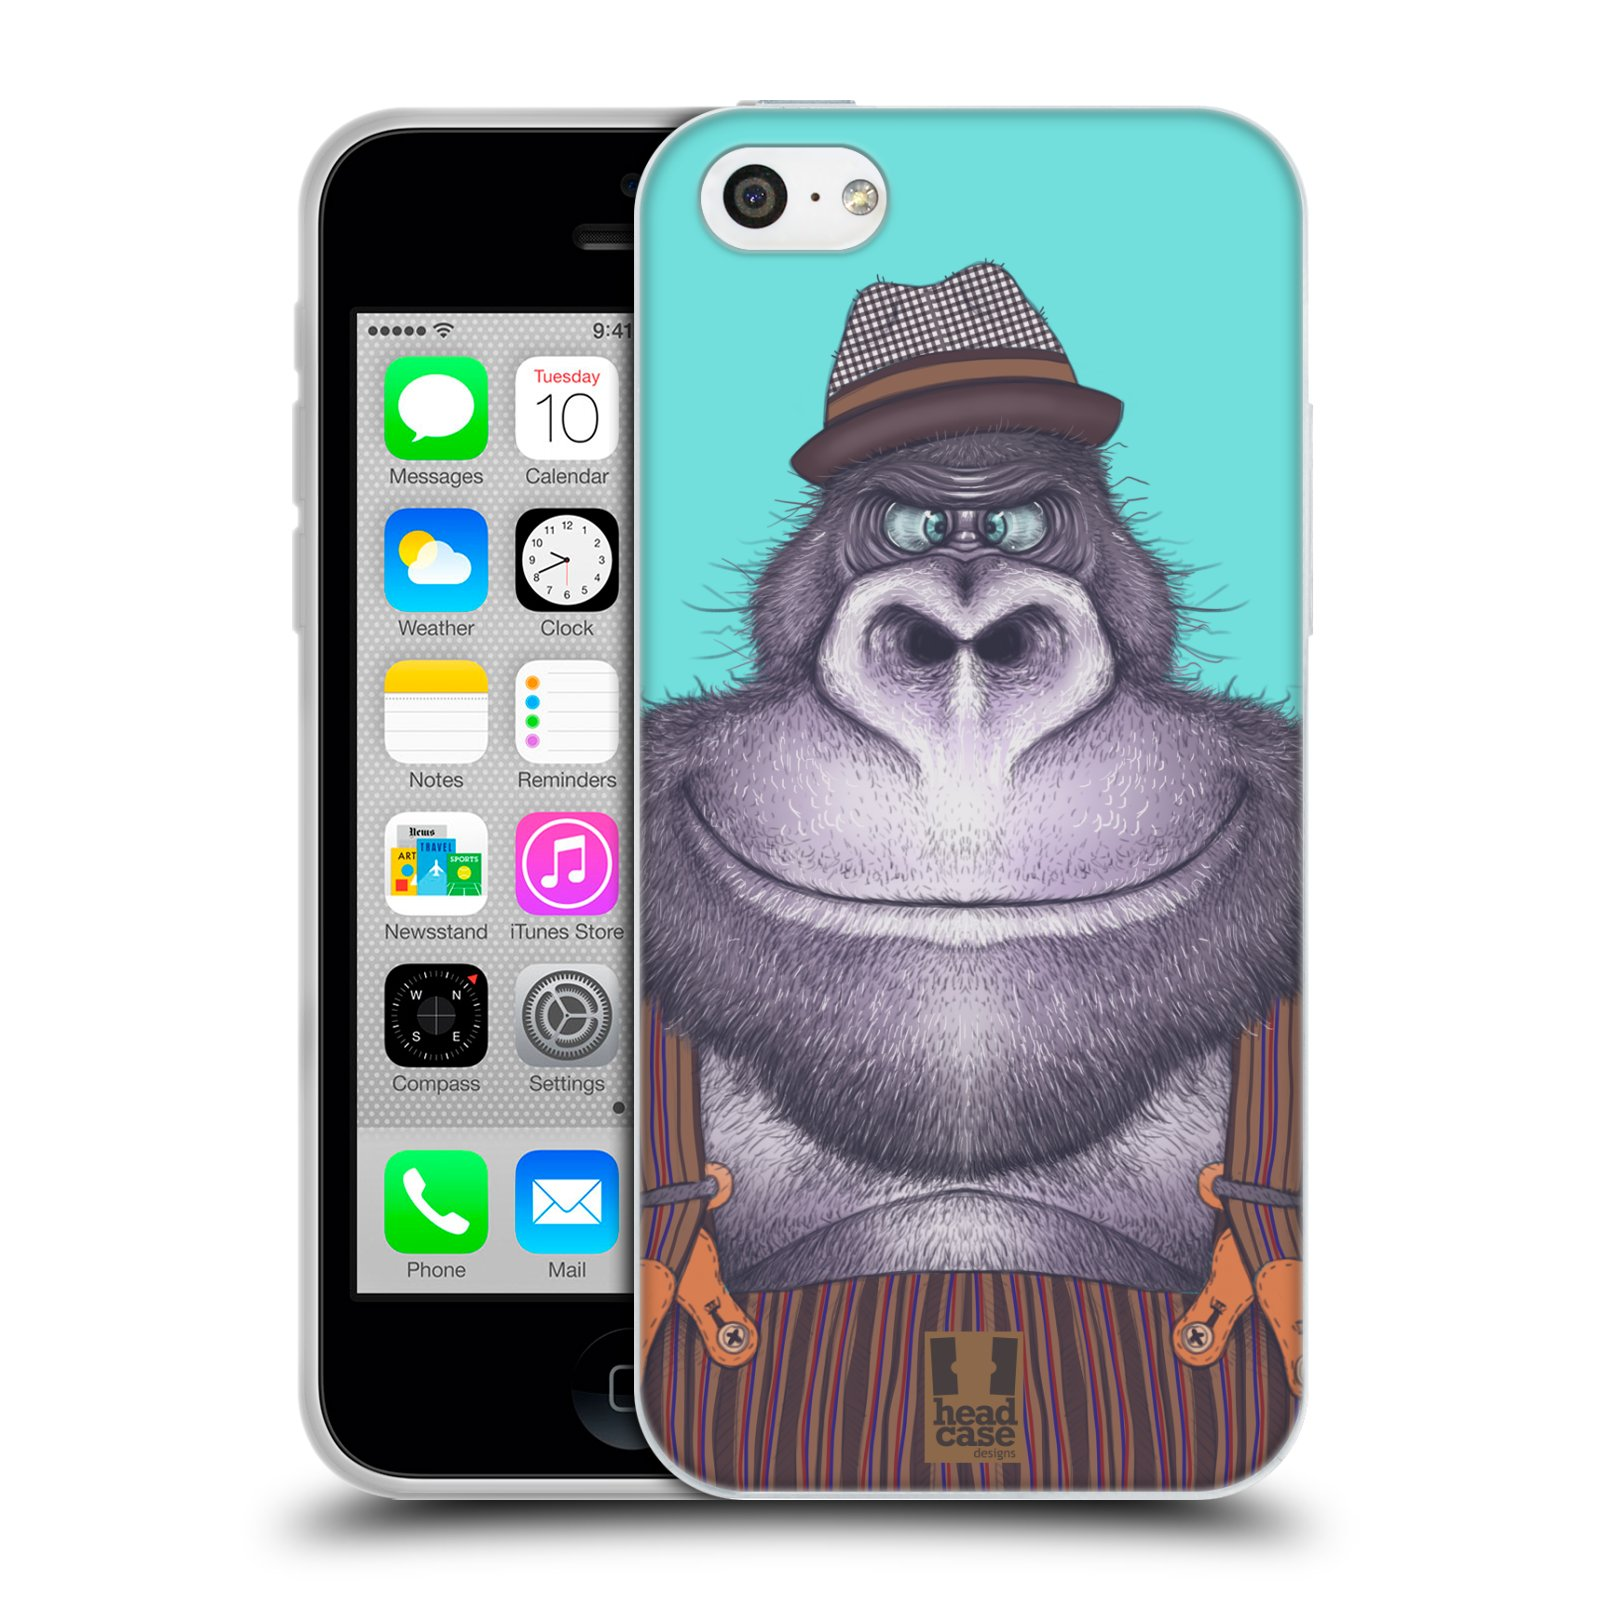 HEAD CASE silikonový obal na mobil Apple Iphone 5C vzor Kreslená zvířátka gorila